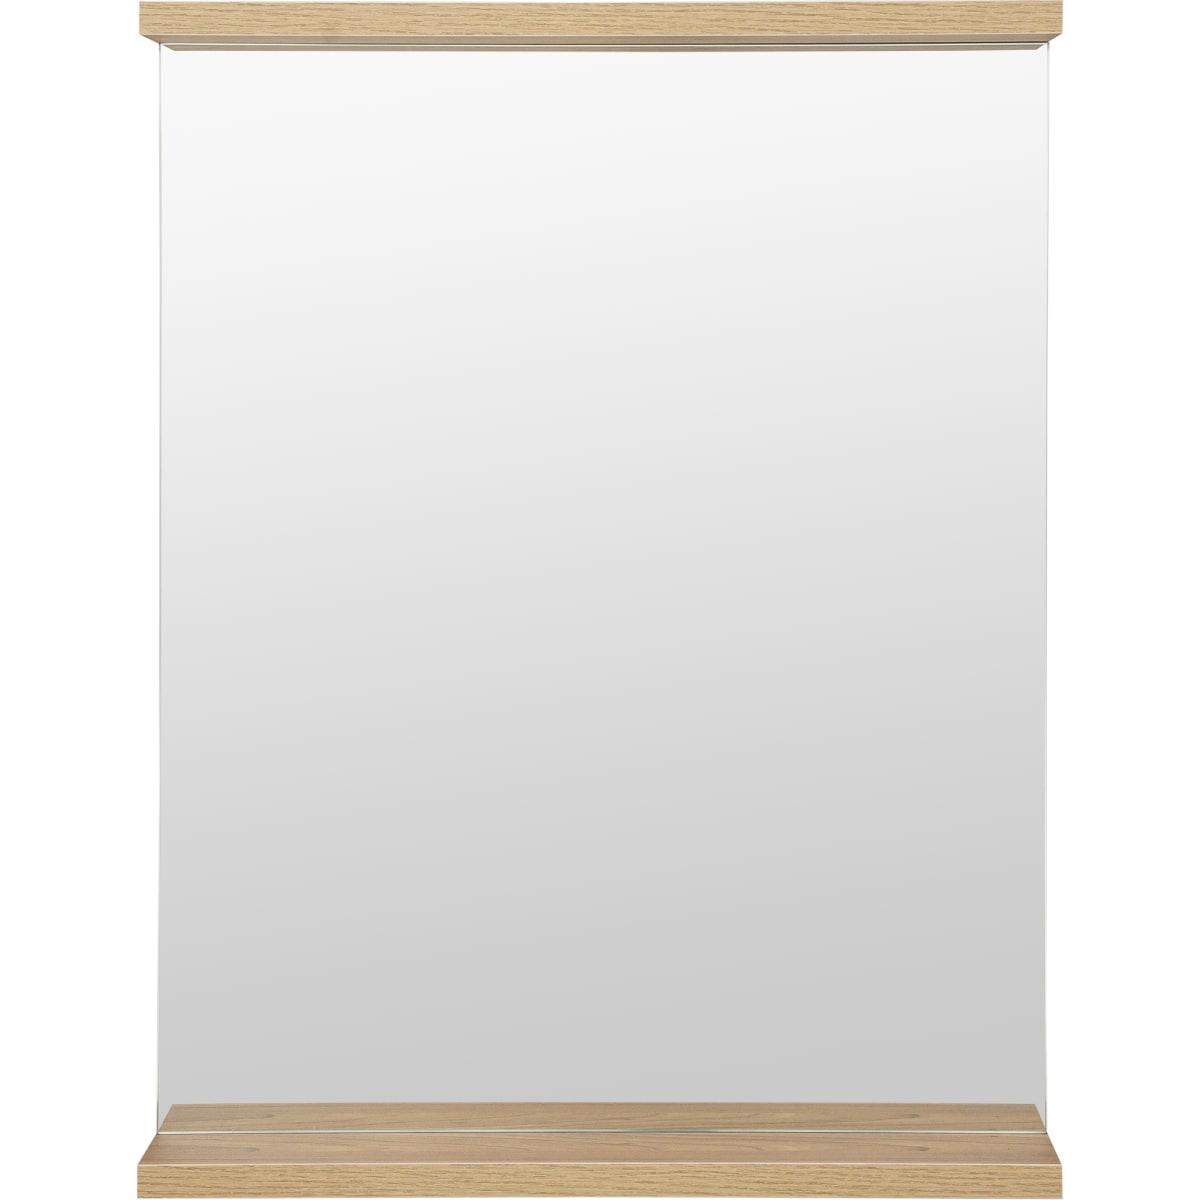 Зеркало «Симпл» 60 см, цвет швейцарский вяз